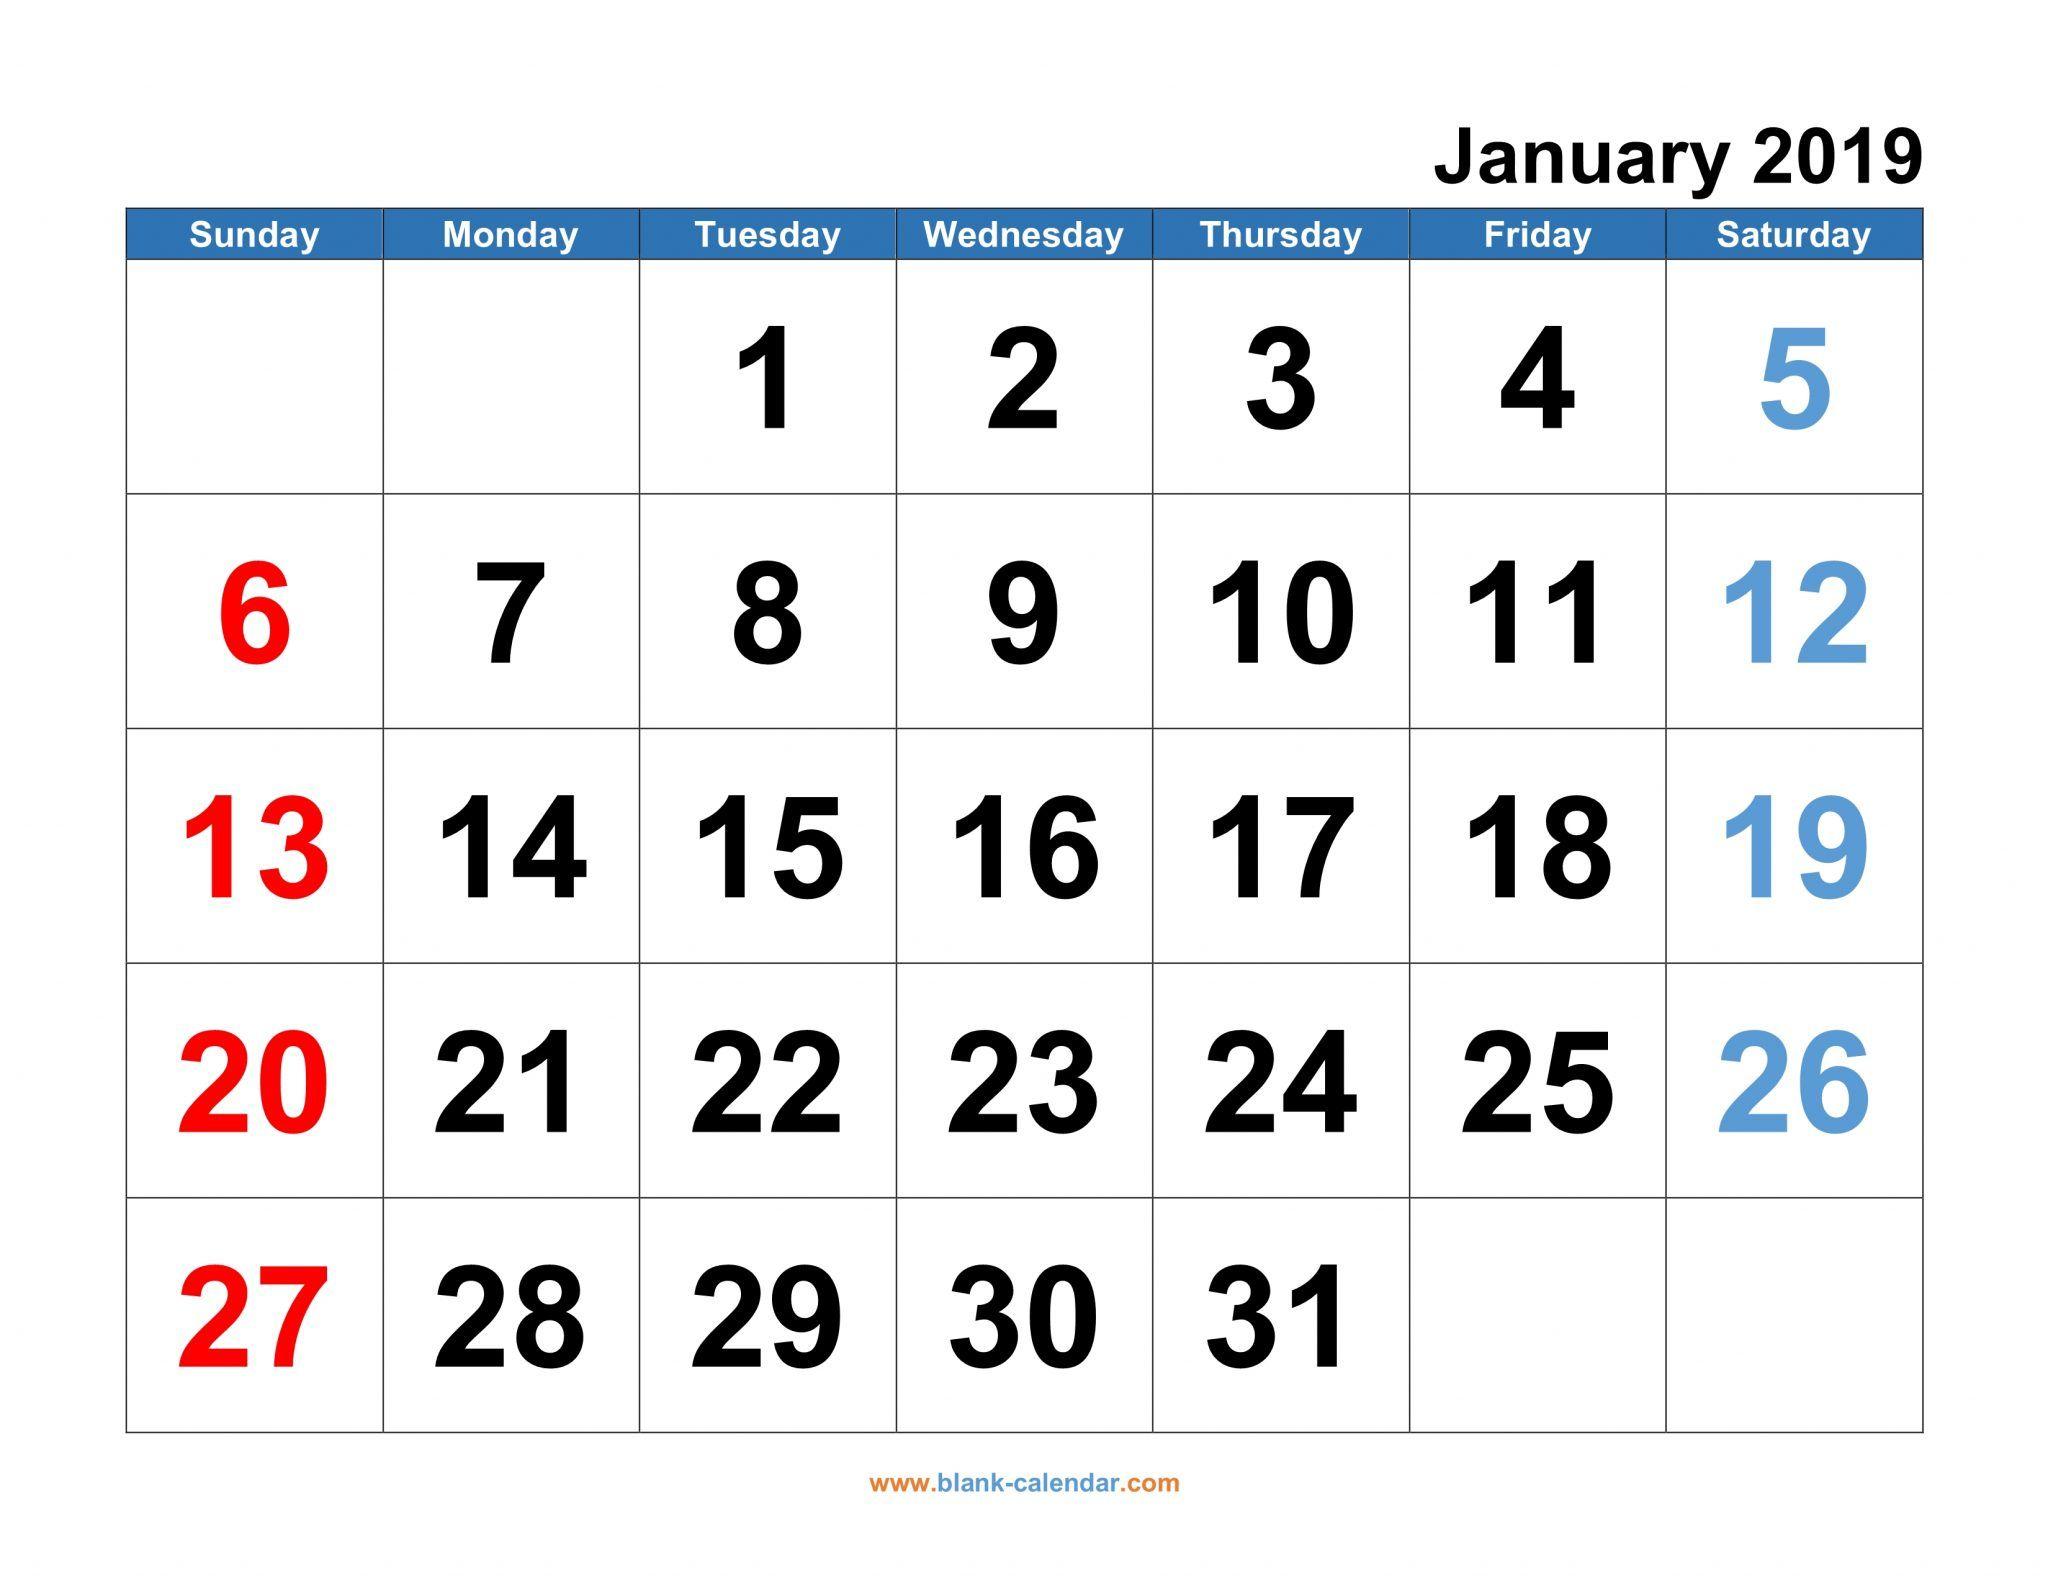 January Calendar 2019 Philippines Blank Monthly Calendar Template Printable Calendar Template Monthly Calendar Template